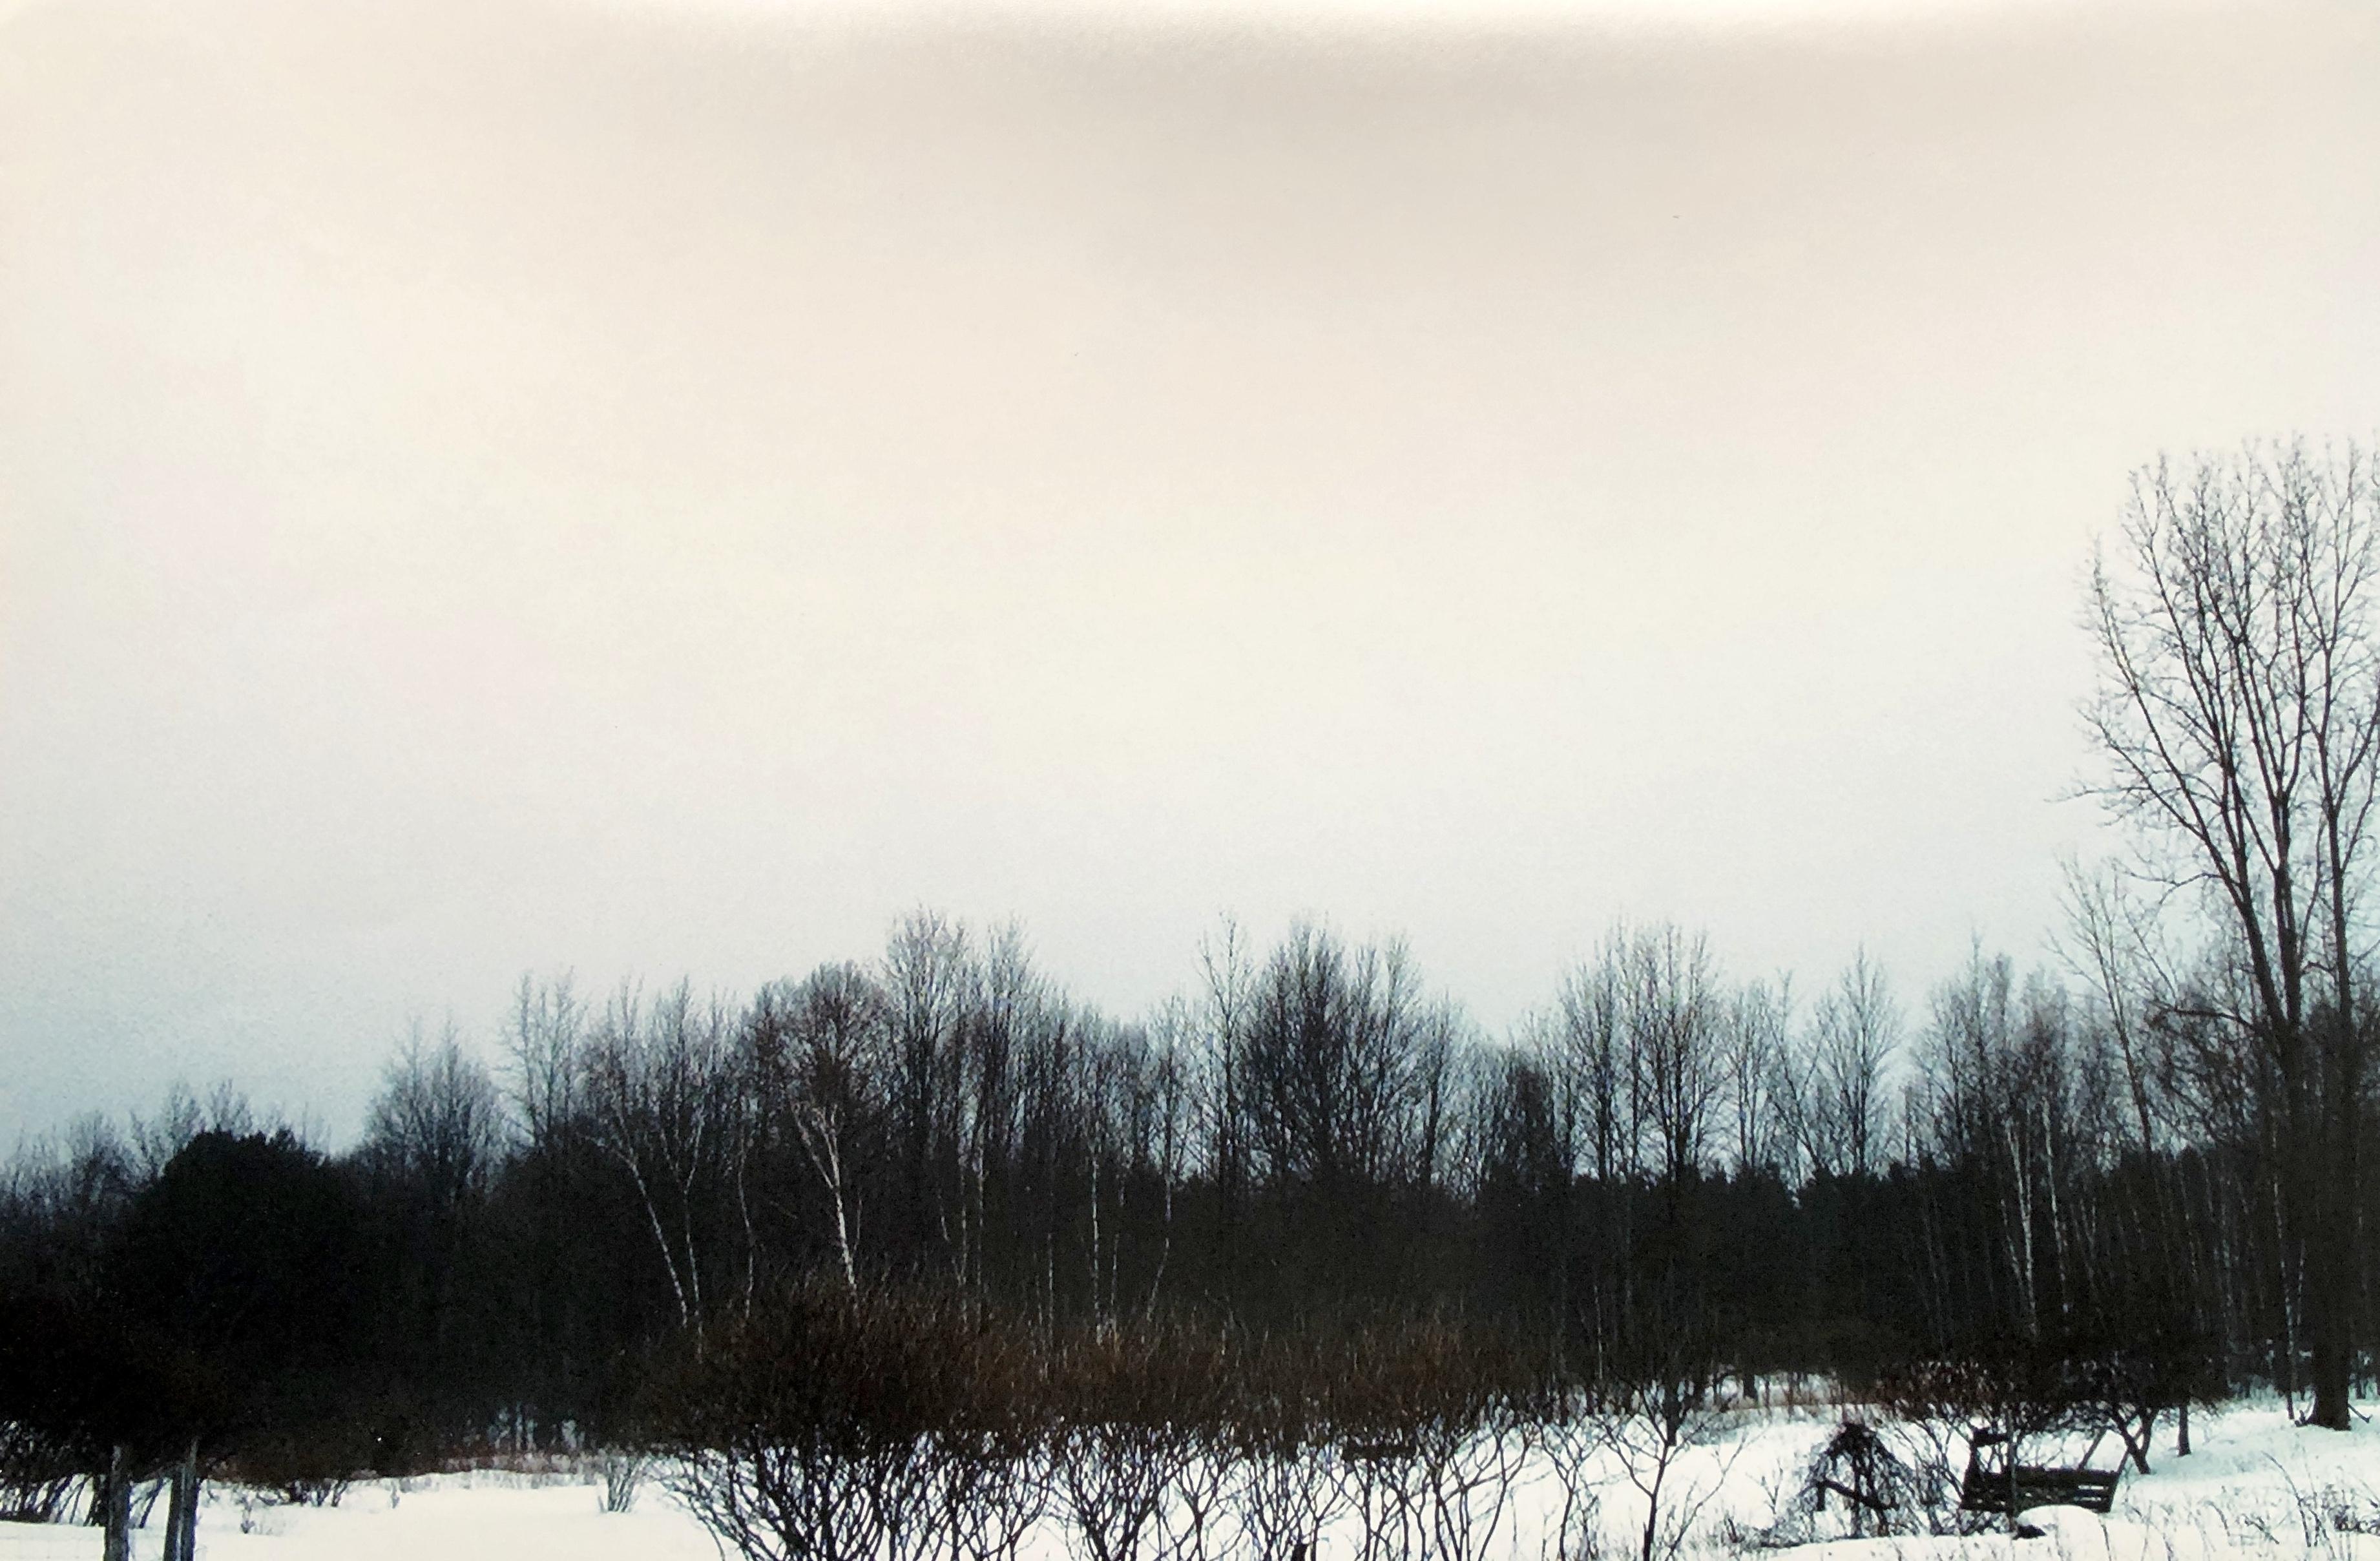 Gray Winter Day